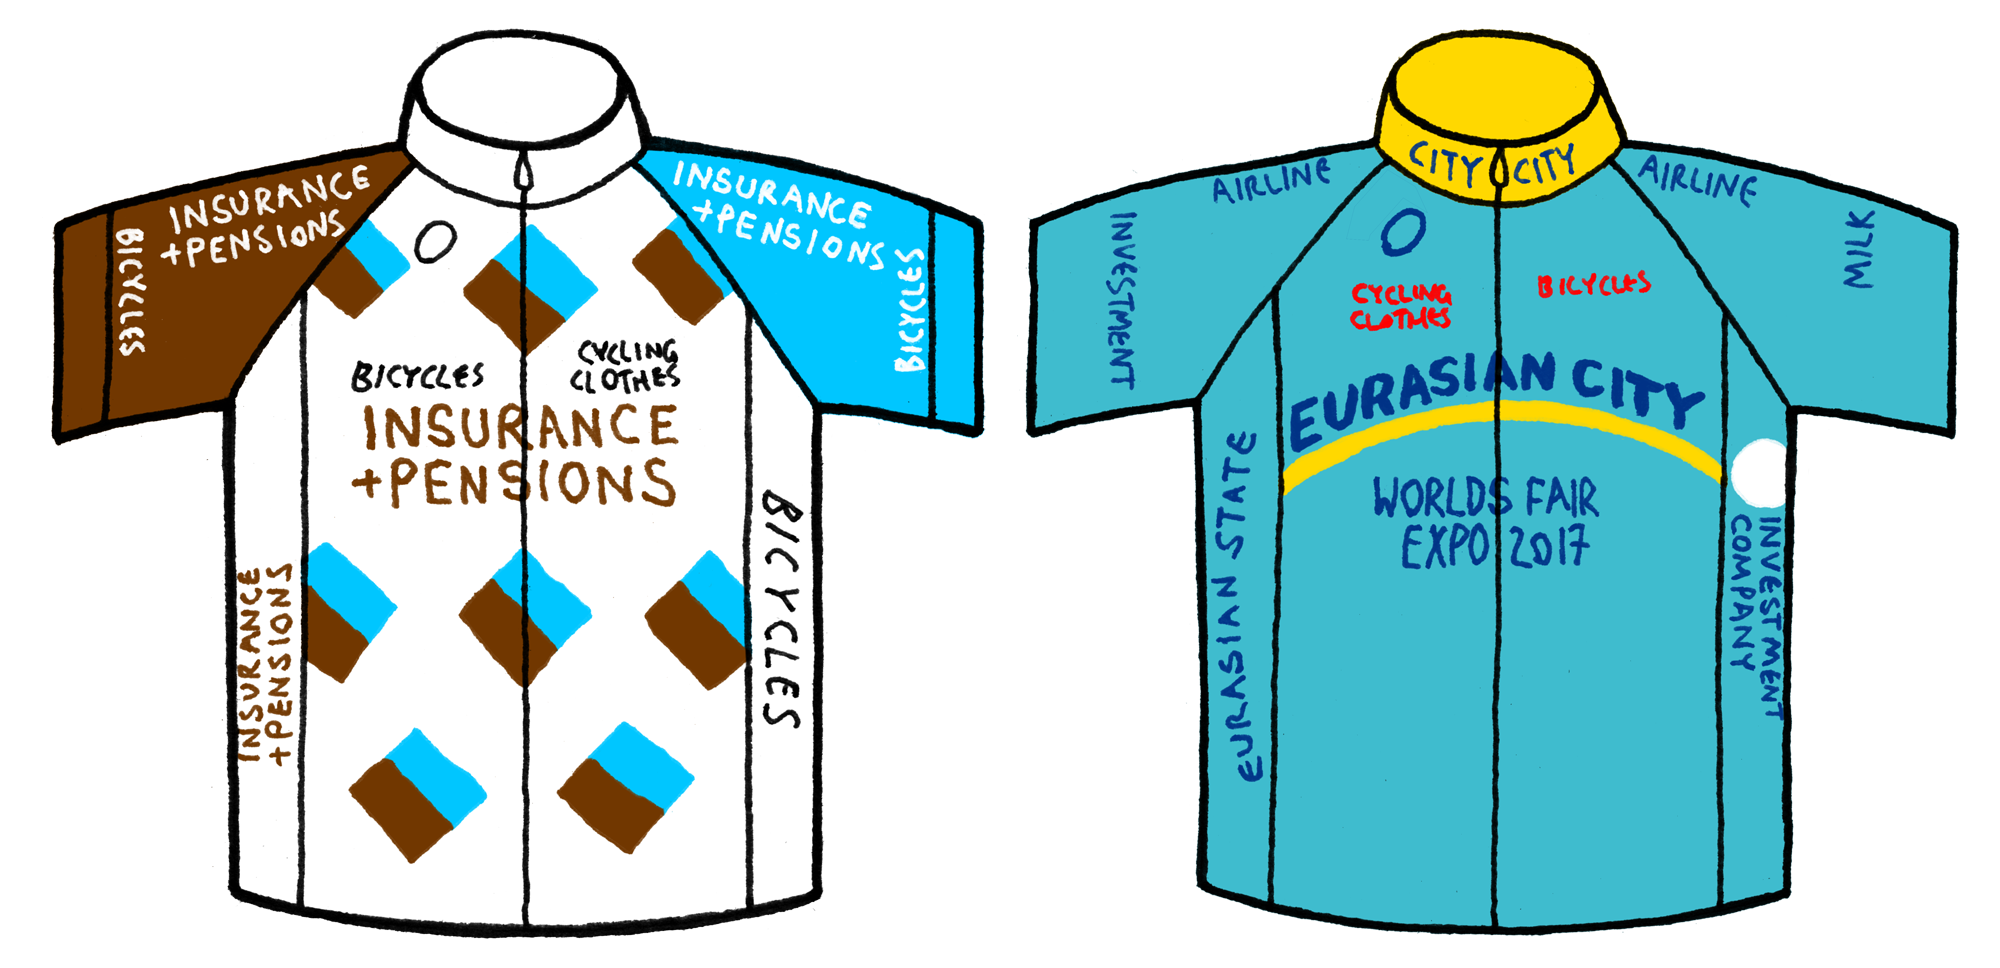 AG2R La Mondiale / Astana